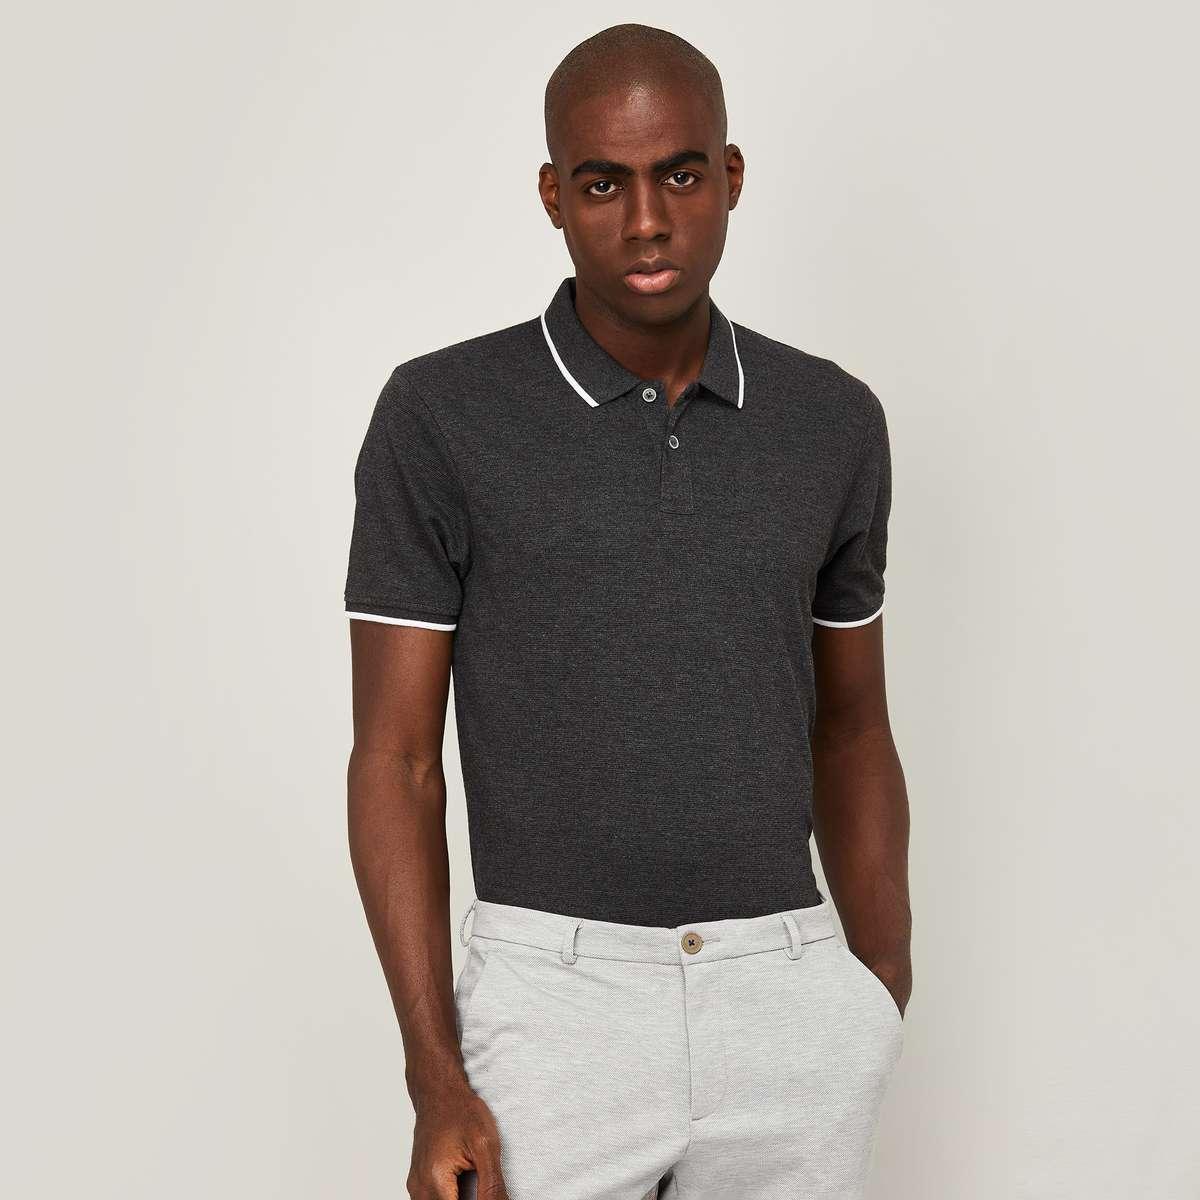 2.CODE Men Solid Regula Fit Polo T-shirt